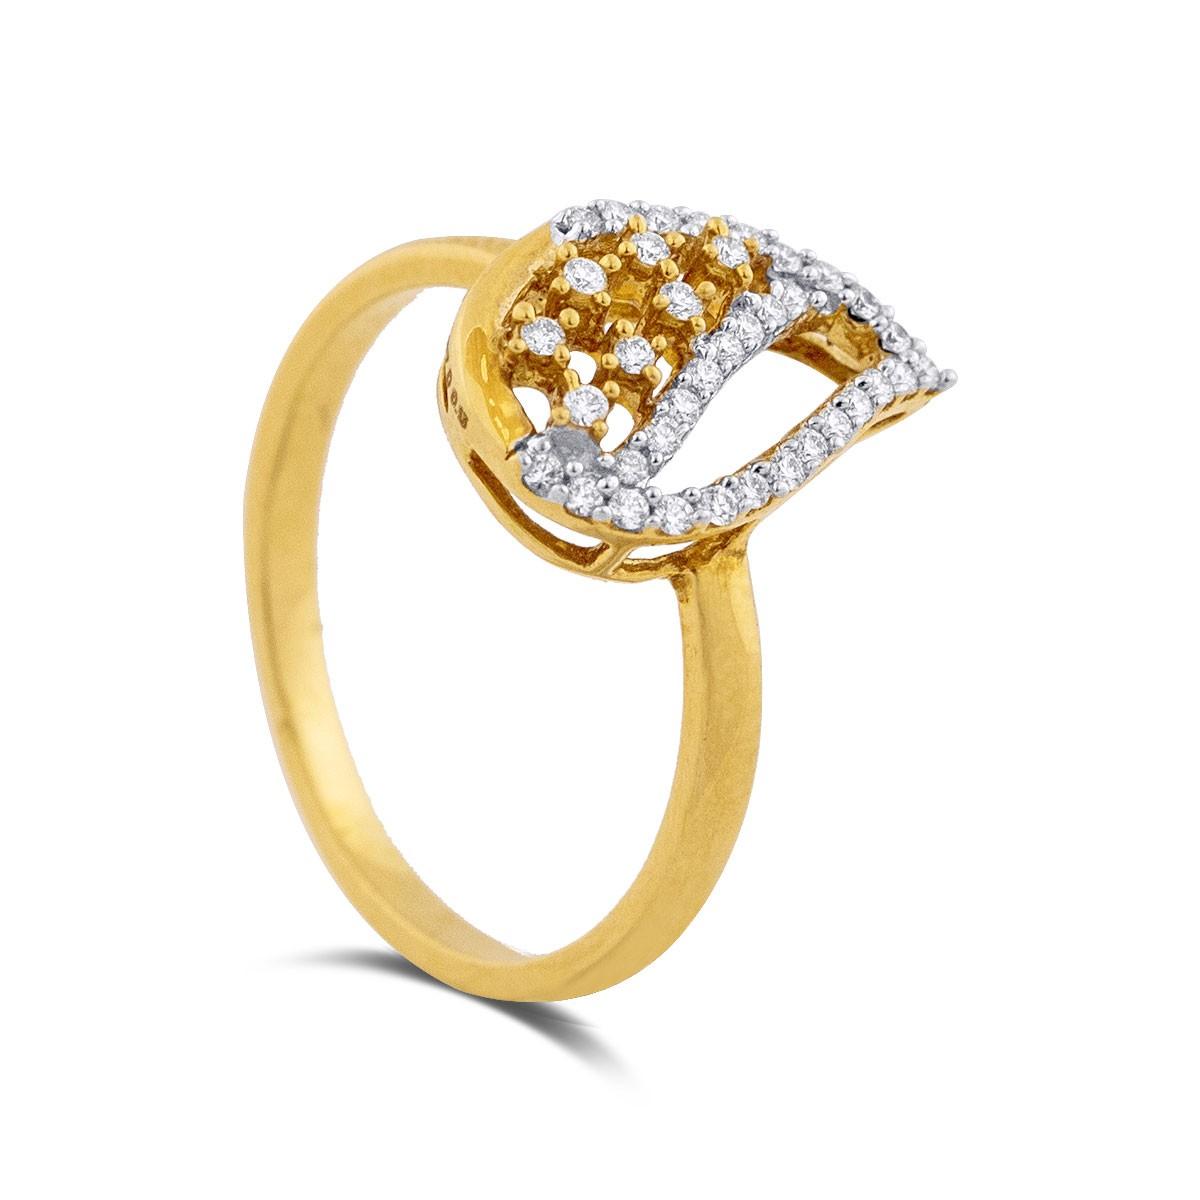 Tanya Yellow Gold Diamond Ring